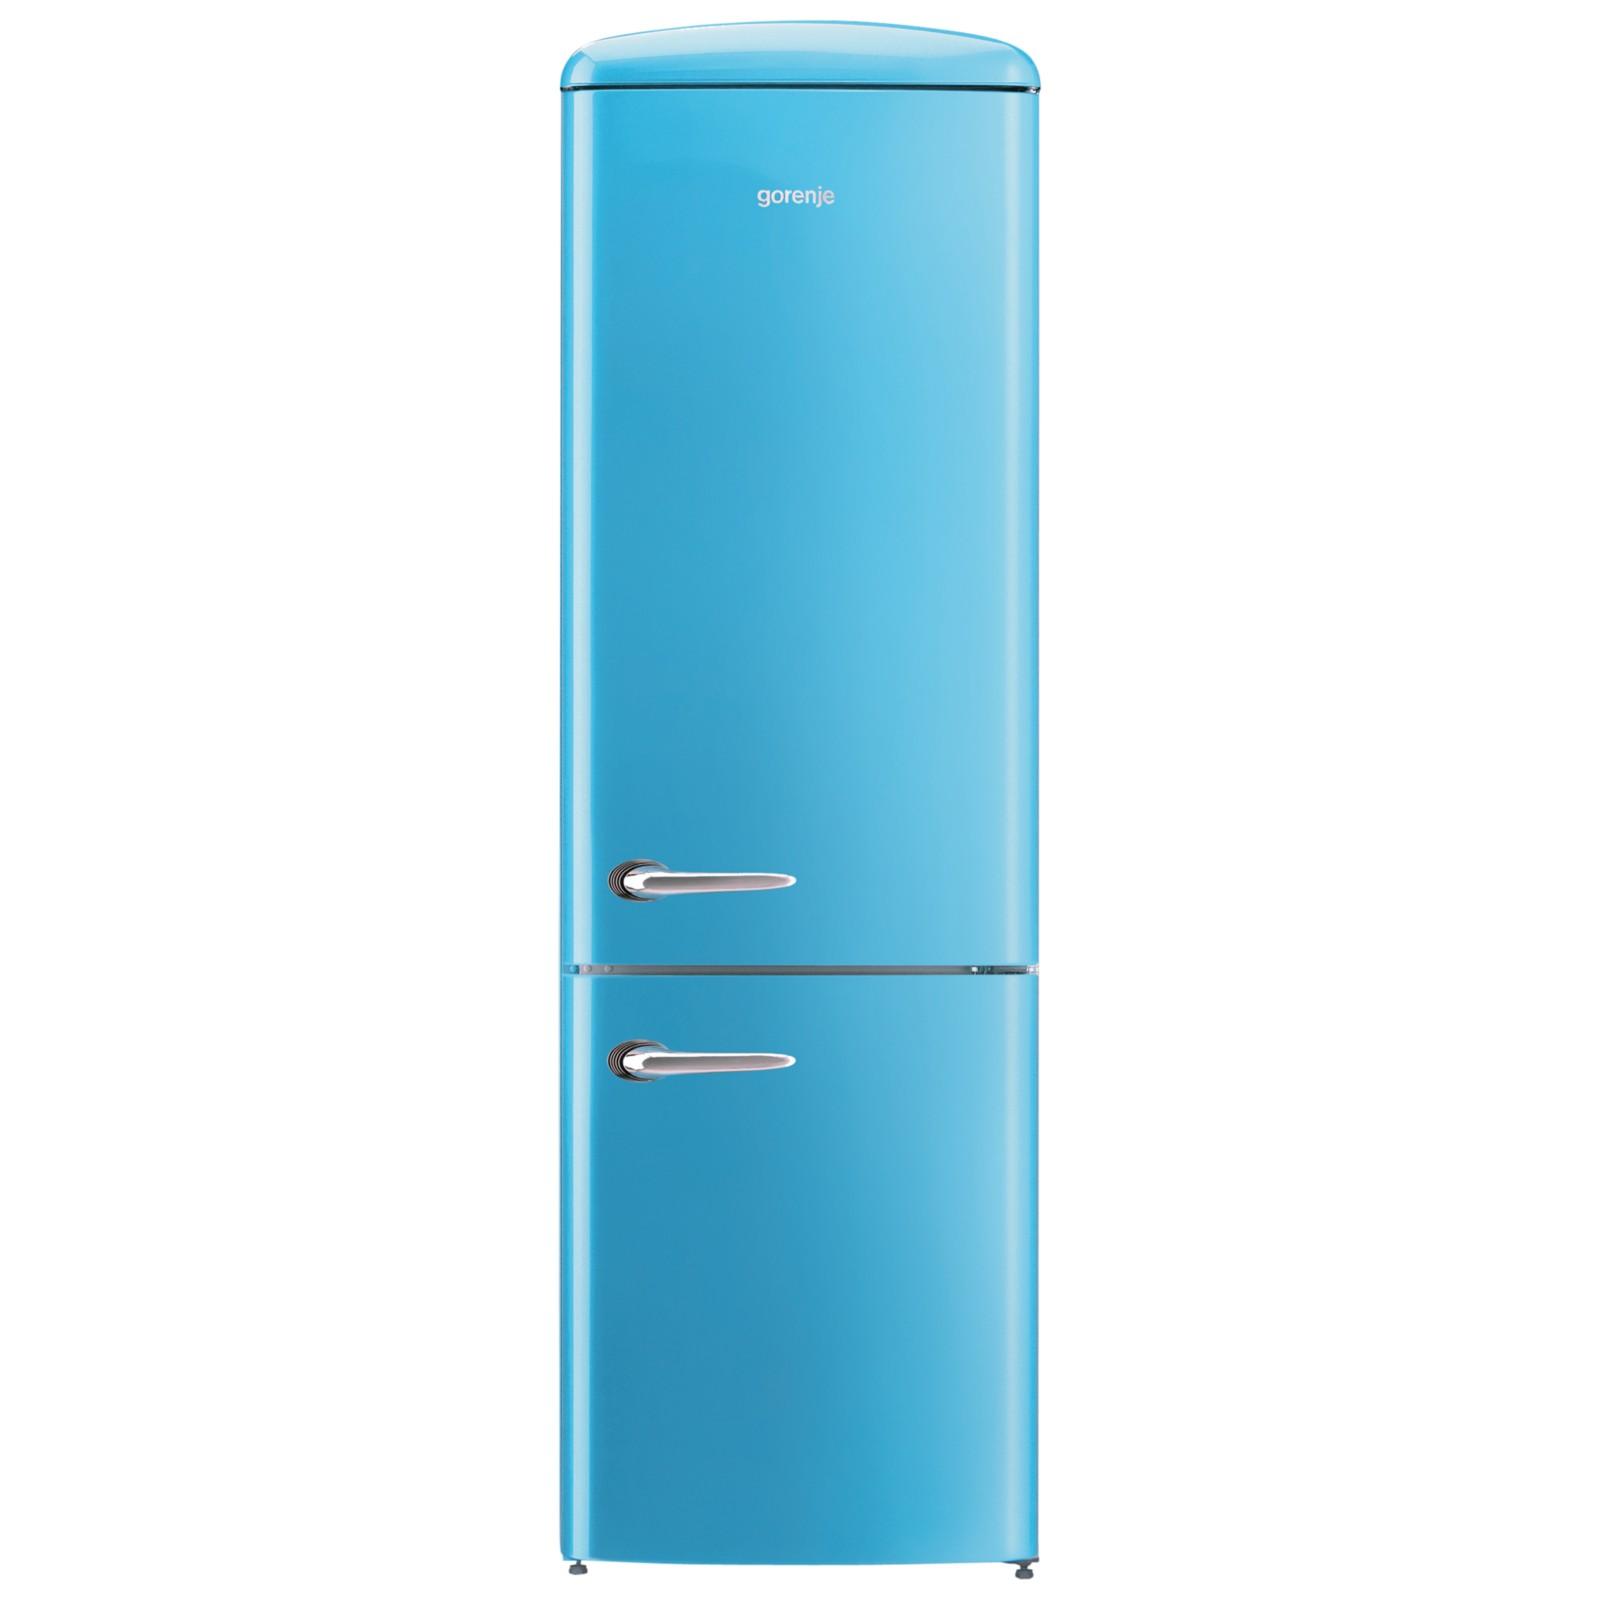 Gorenje ORK193 Freestanding Fridge Freezer